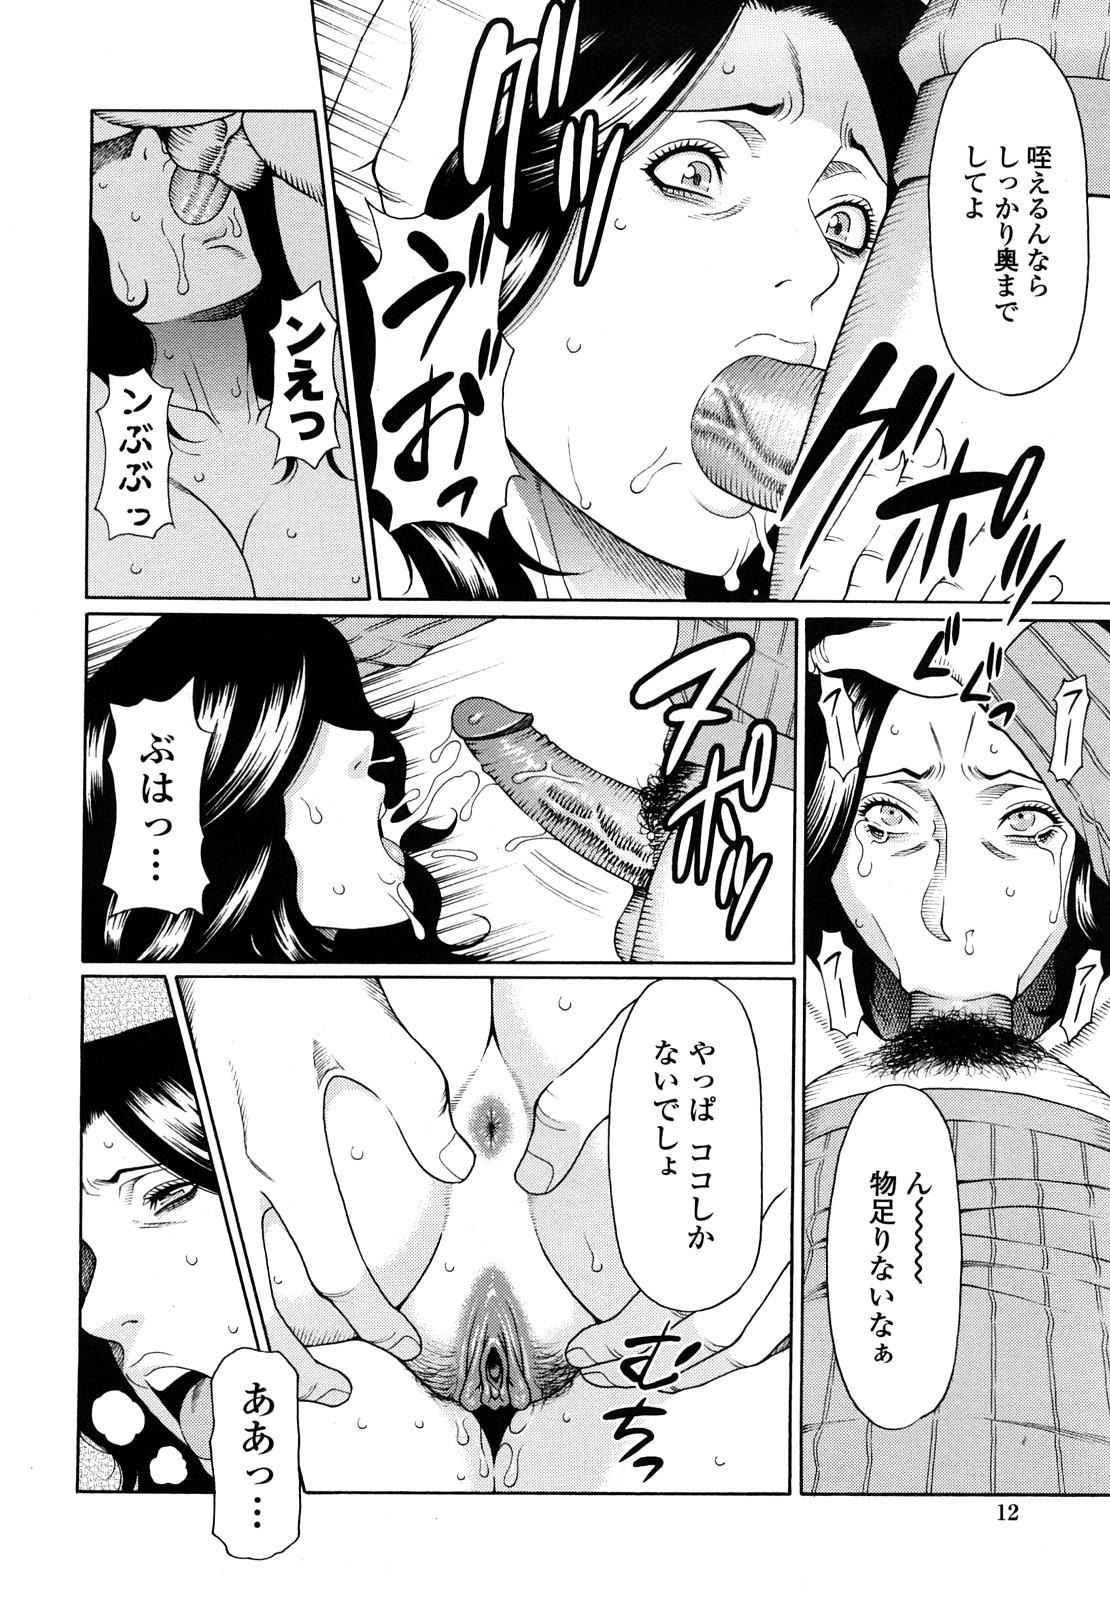 [Takasugi Kou] Kindan no Haha-Ana - Immorality Love-Hole [Decensored] 13